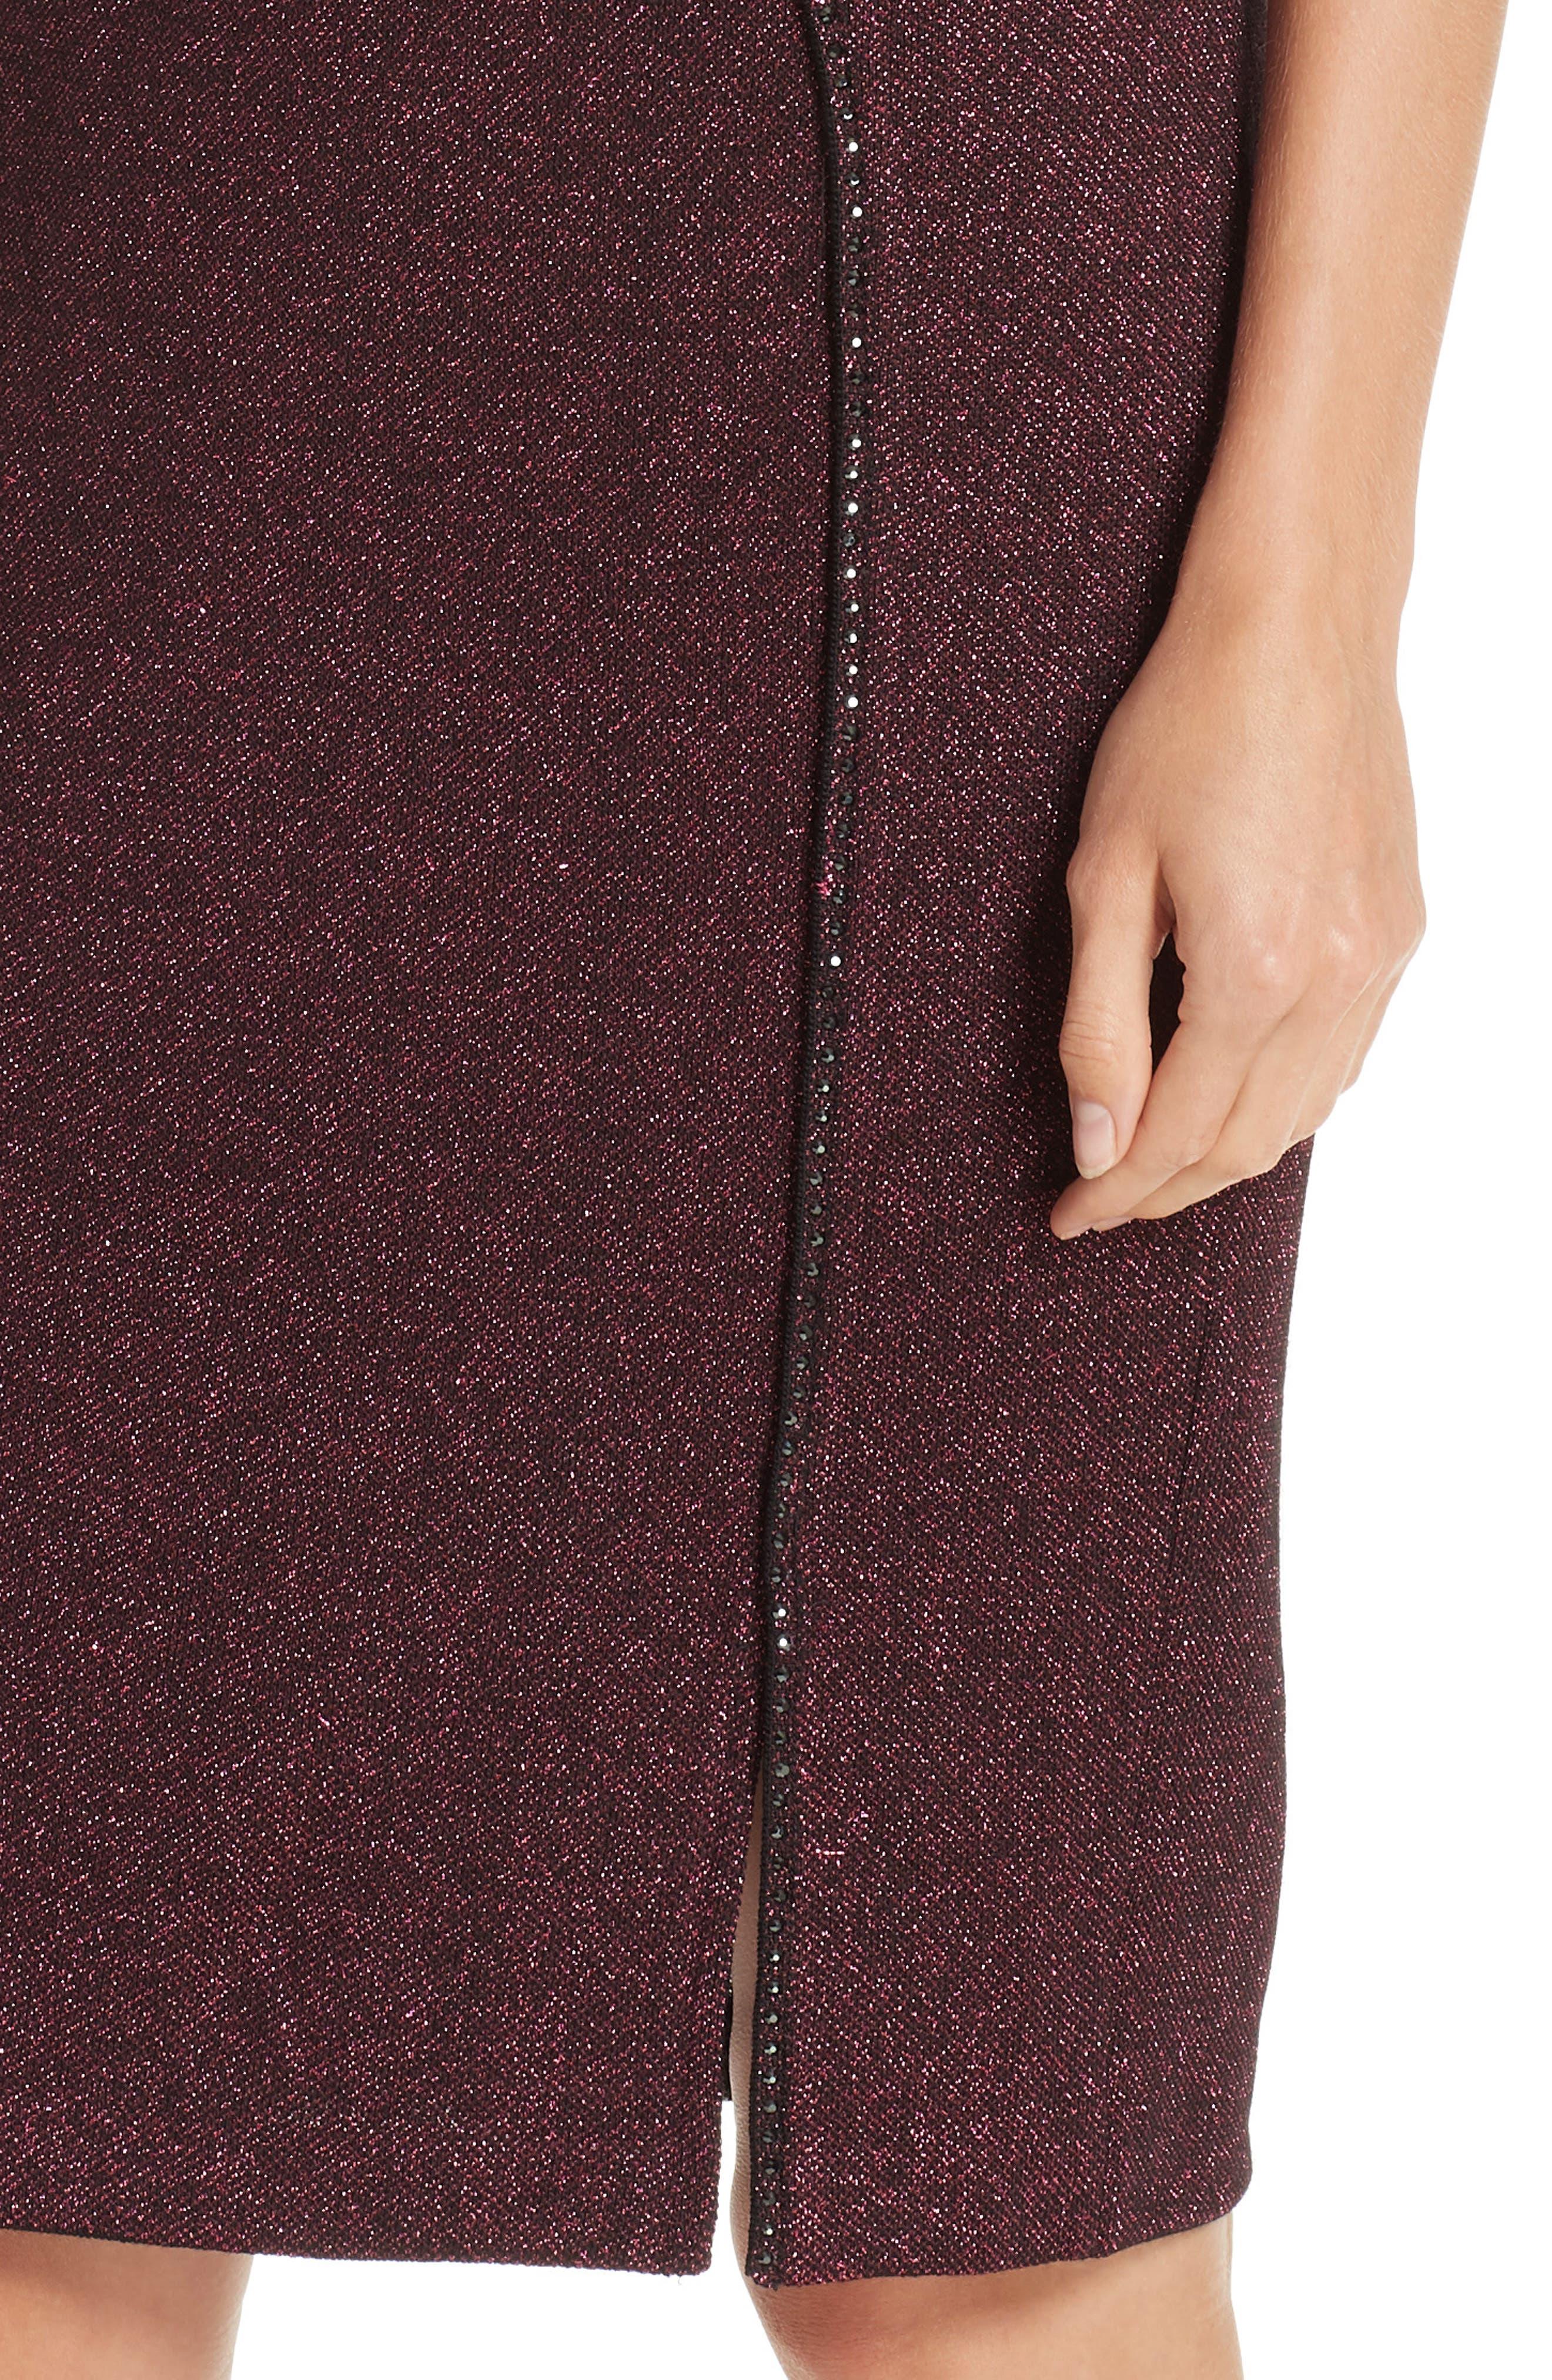 ST. JOHN COLLECTION, Mod Metallic Knit Sheath Dress, Alternate thumbnail 5, color, DARK PINK MULTI